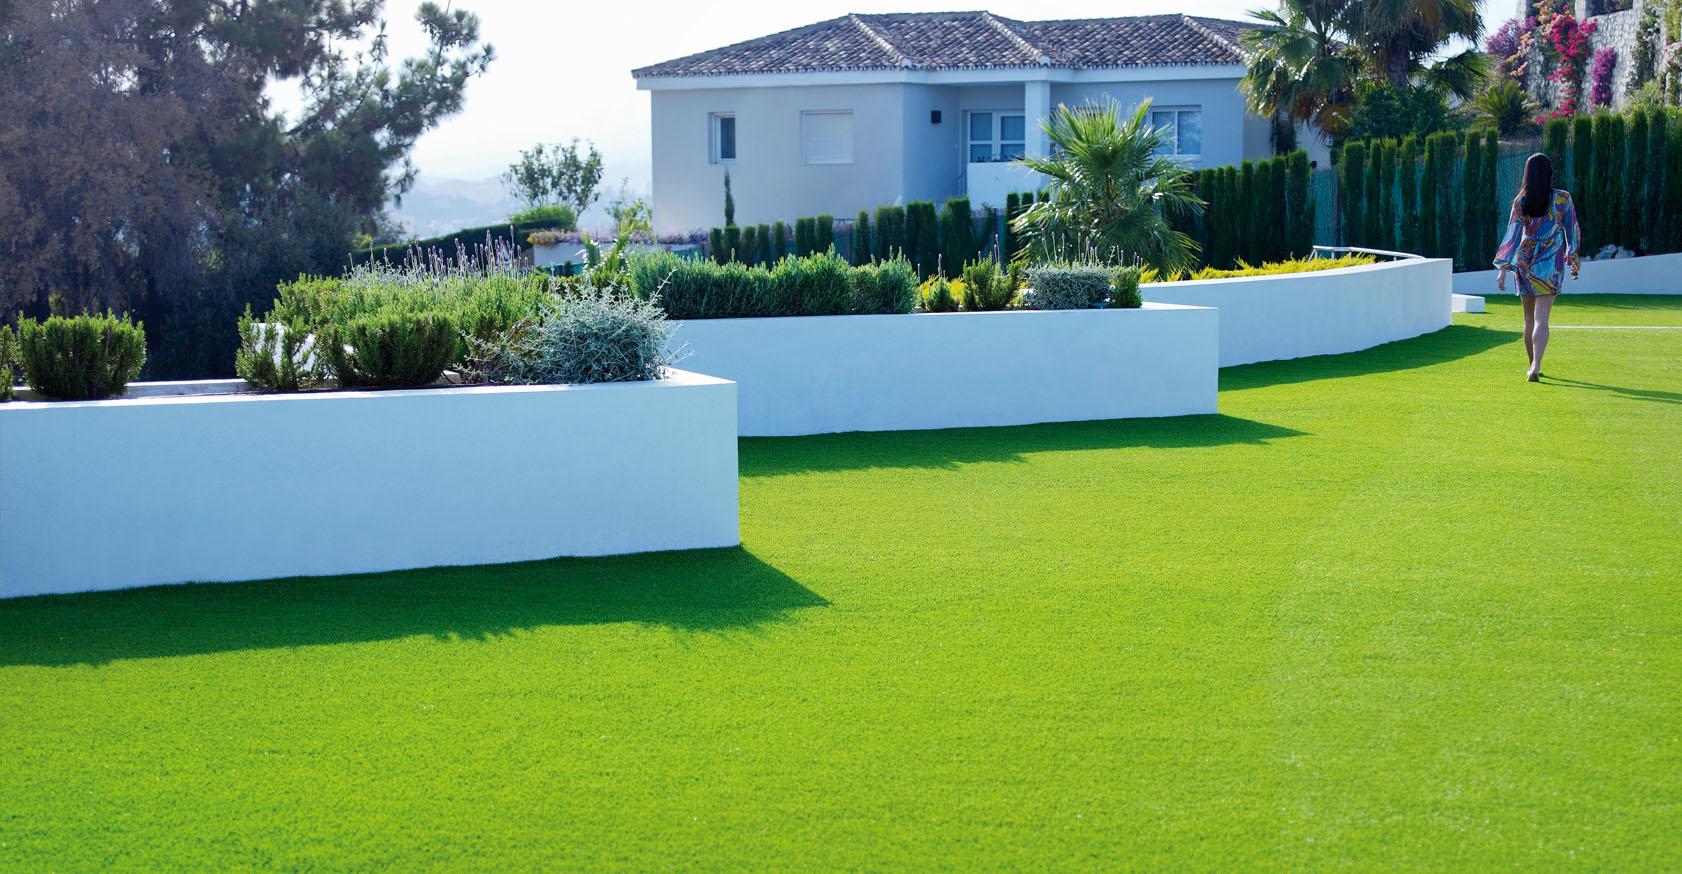 grama sintetica para jardim em curitiba:Artificial Grass Installer